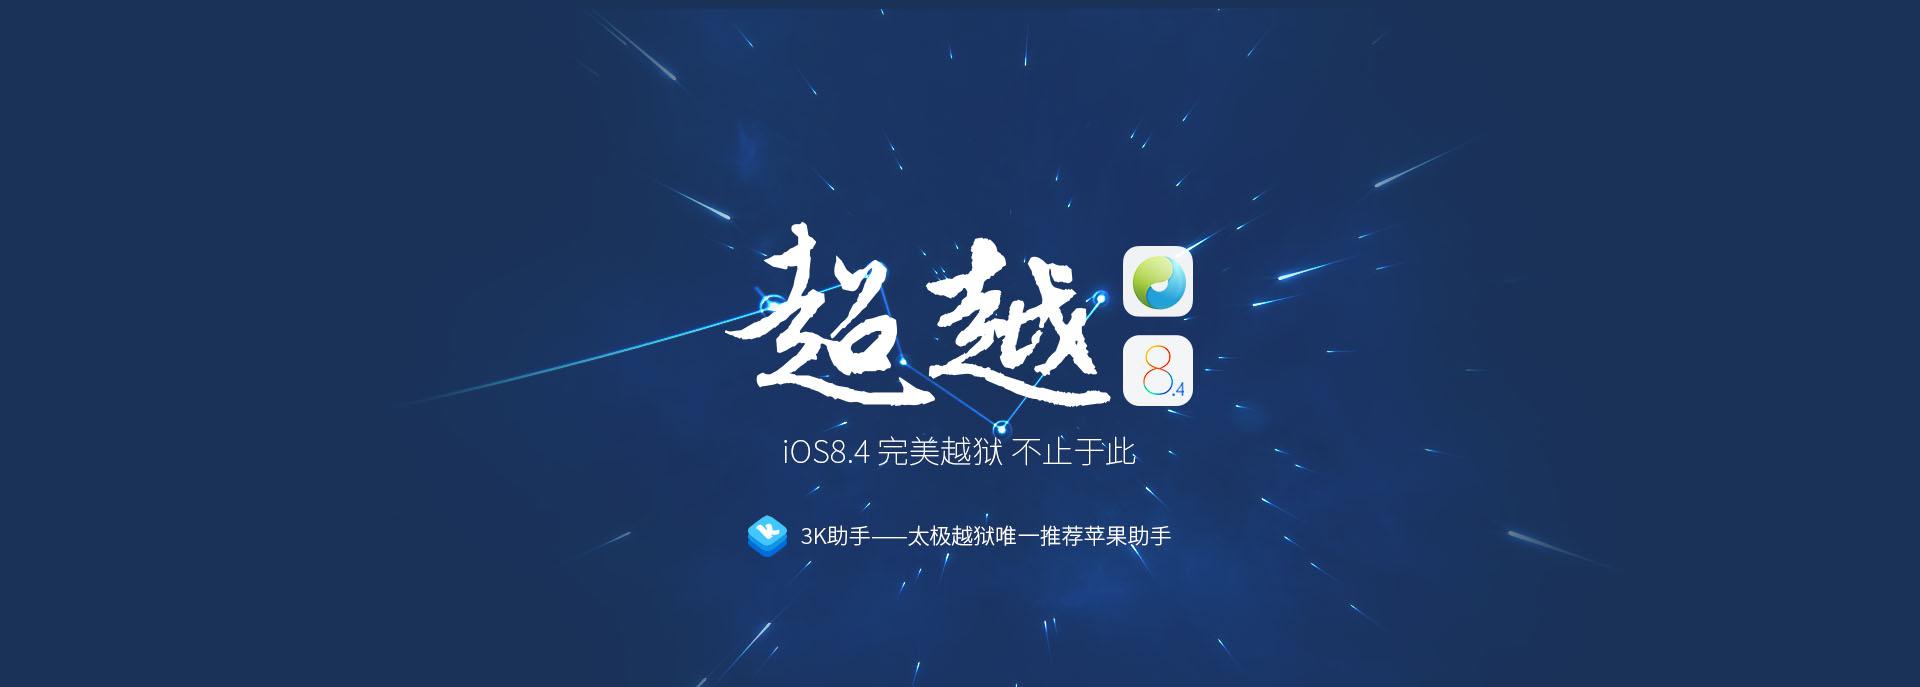 Jailbreak para o iOS 8.4 do TaiG